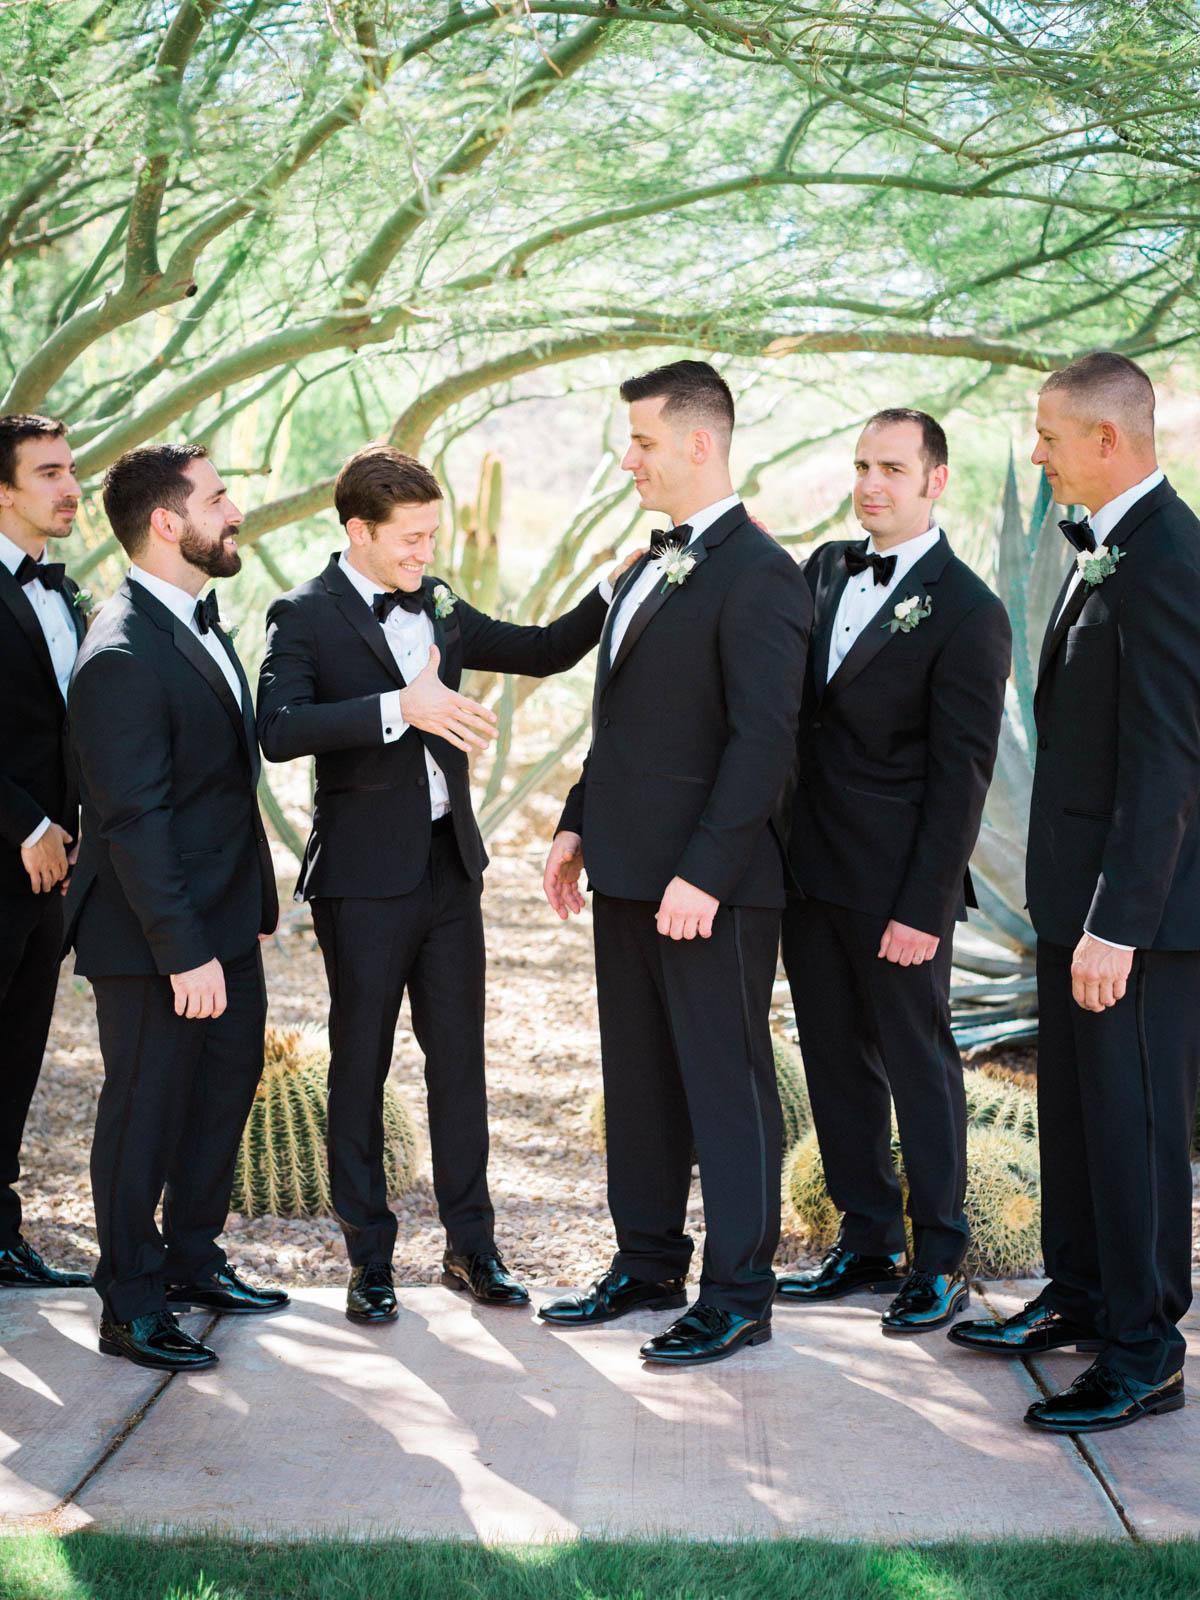 Groom with groomsmen captured by Tucson Wedding Photographers Betsy & John